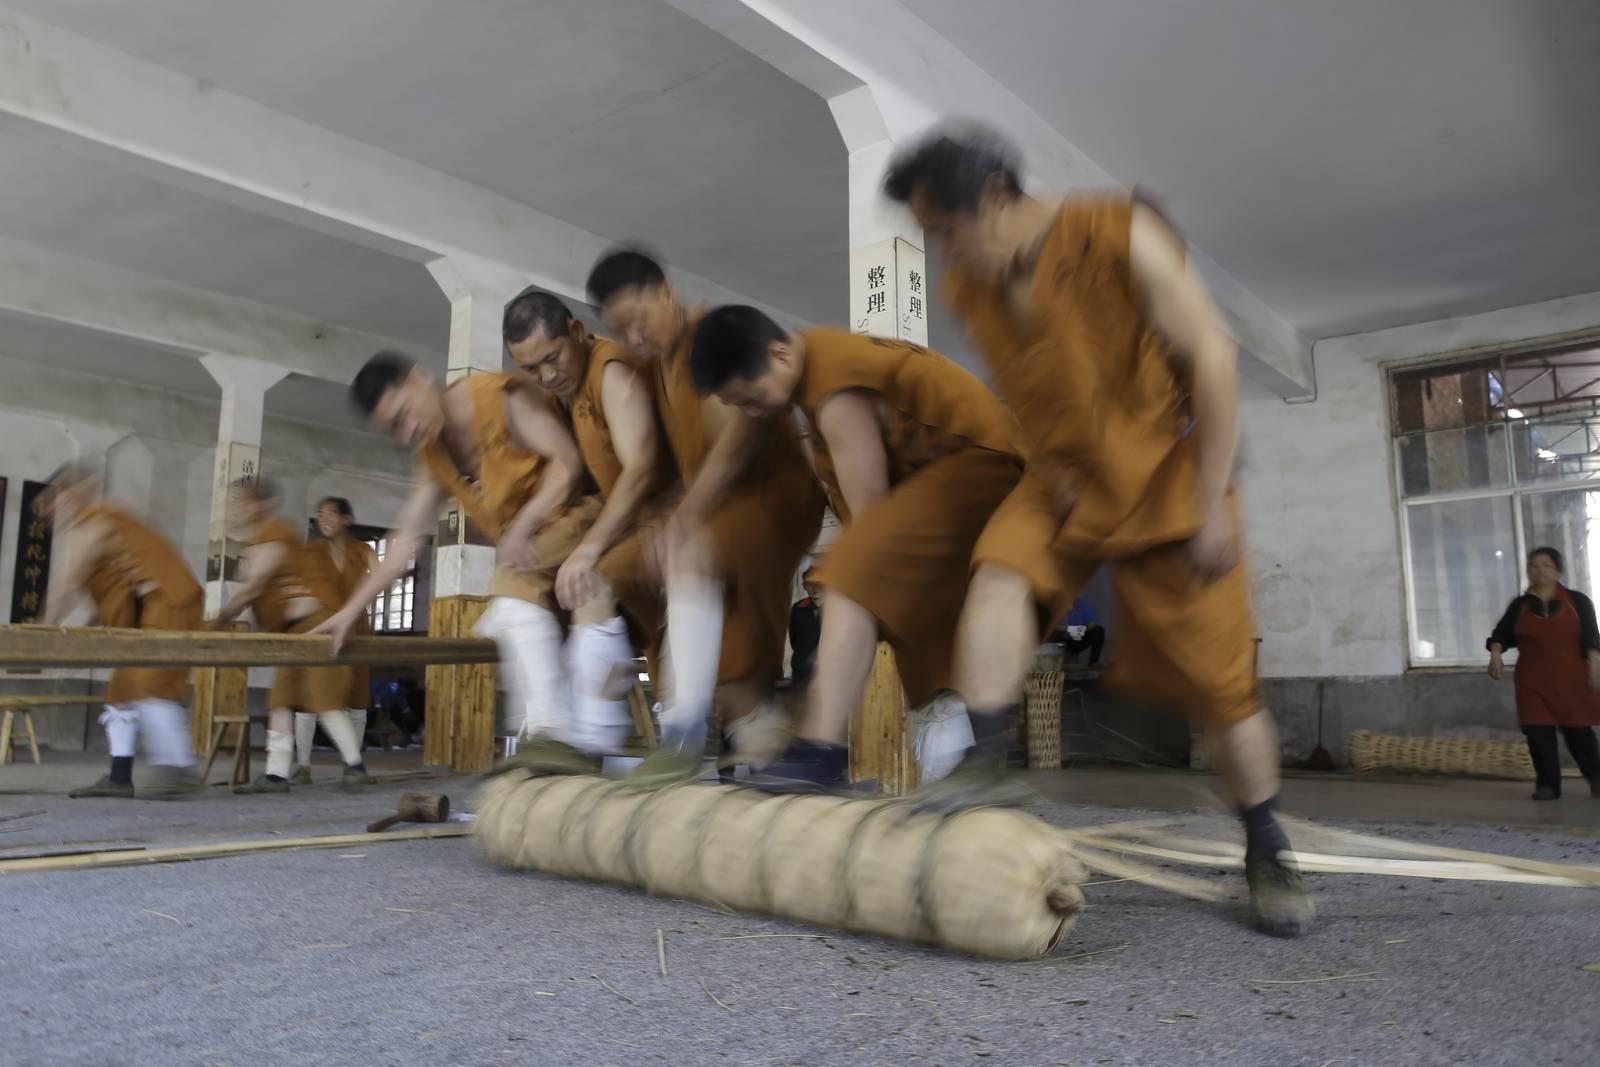 China portraits, the tea rollers